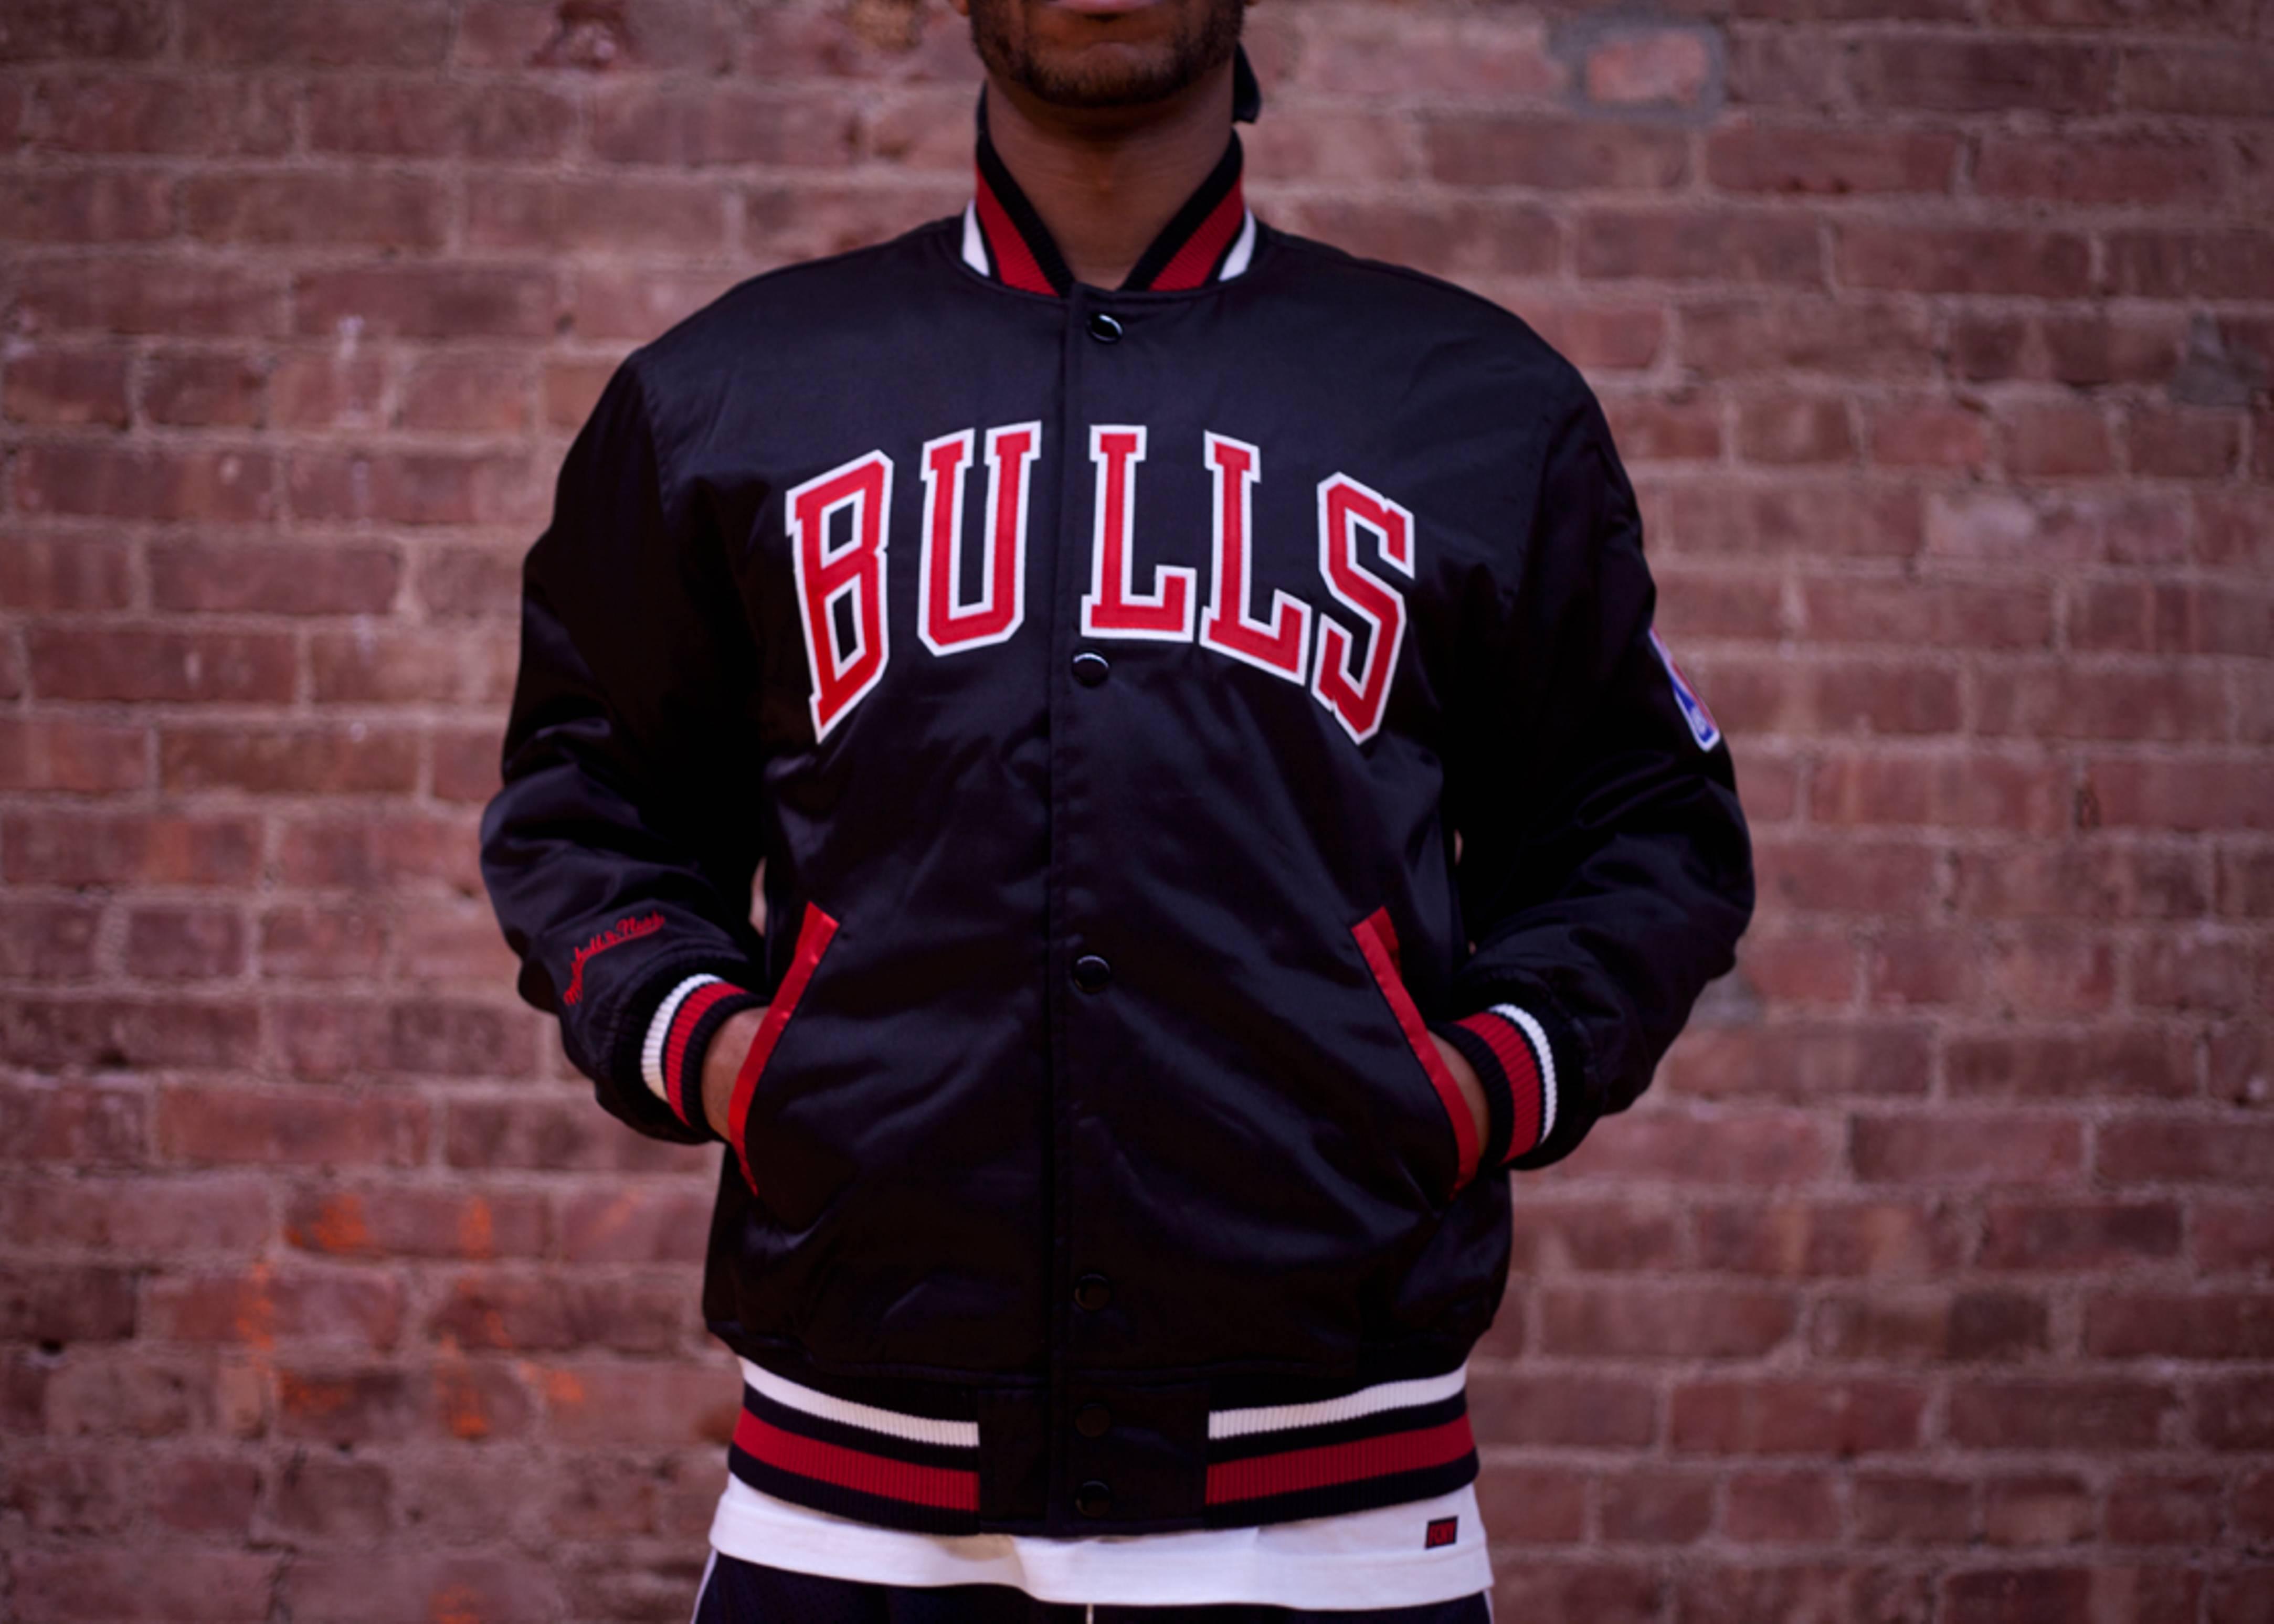 chicago bulls nba satin jacket